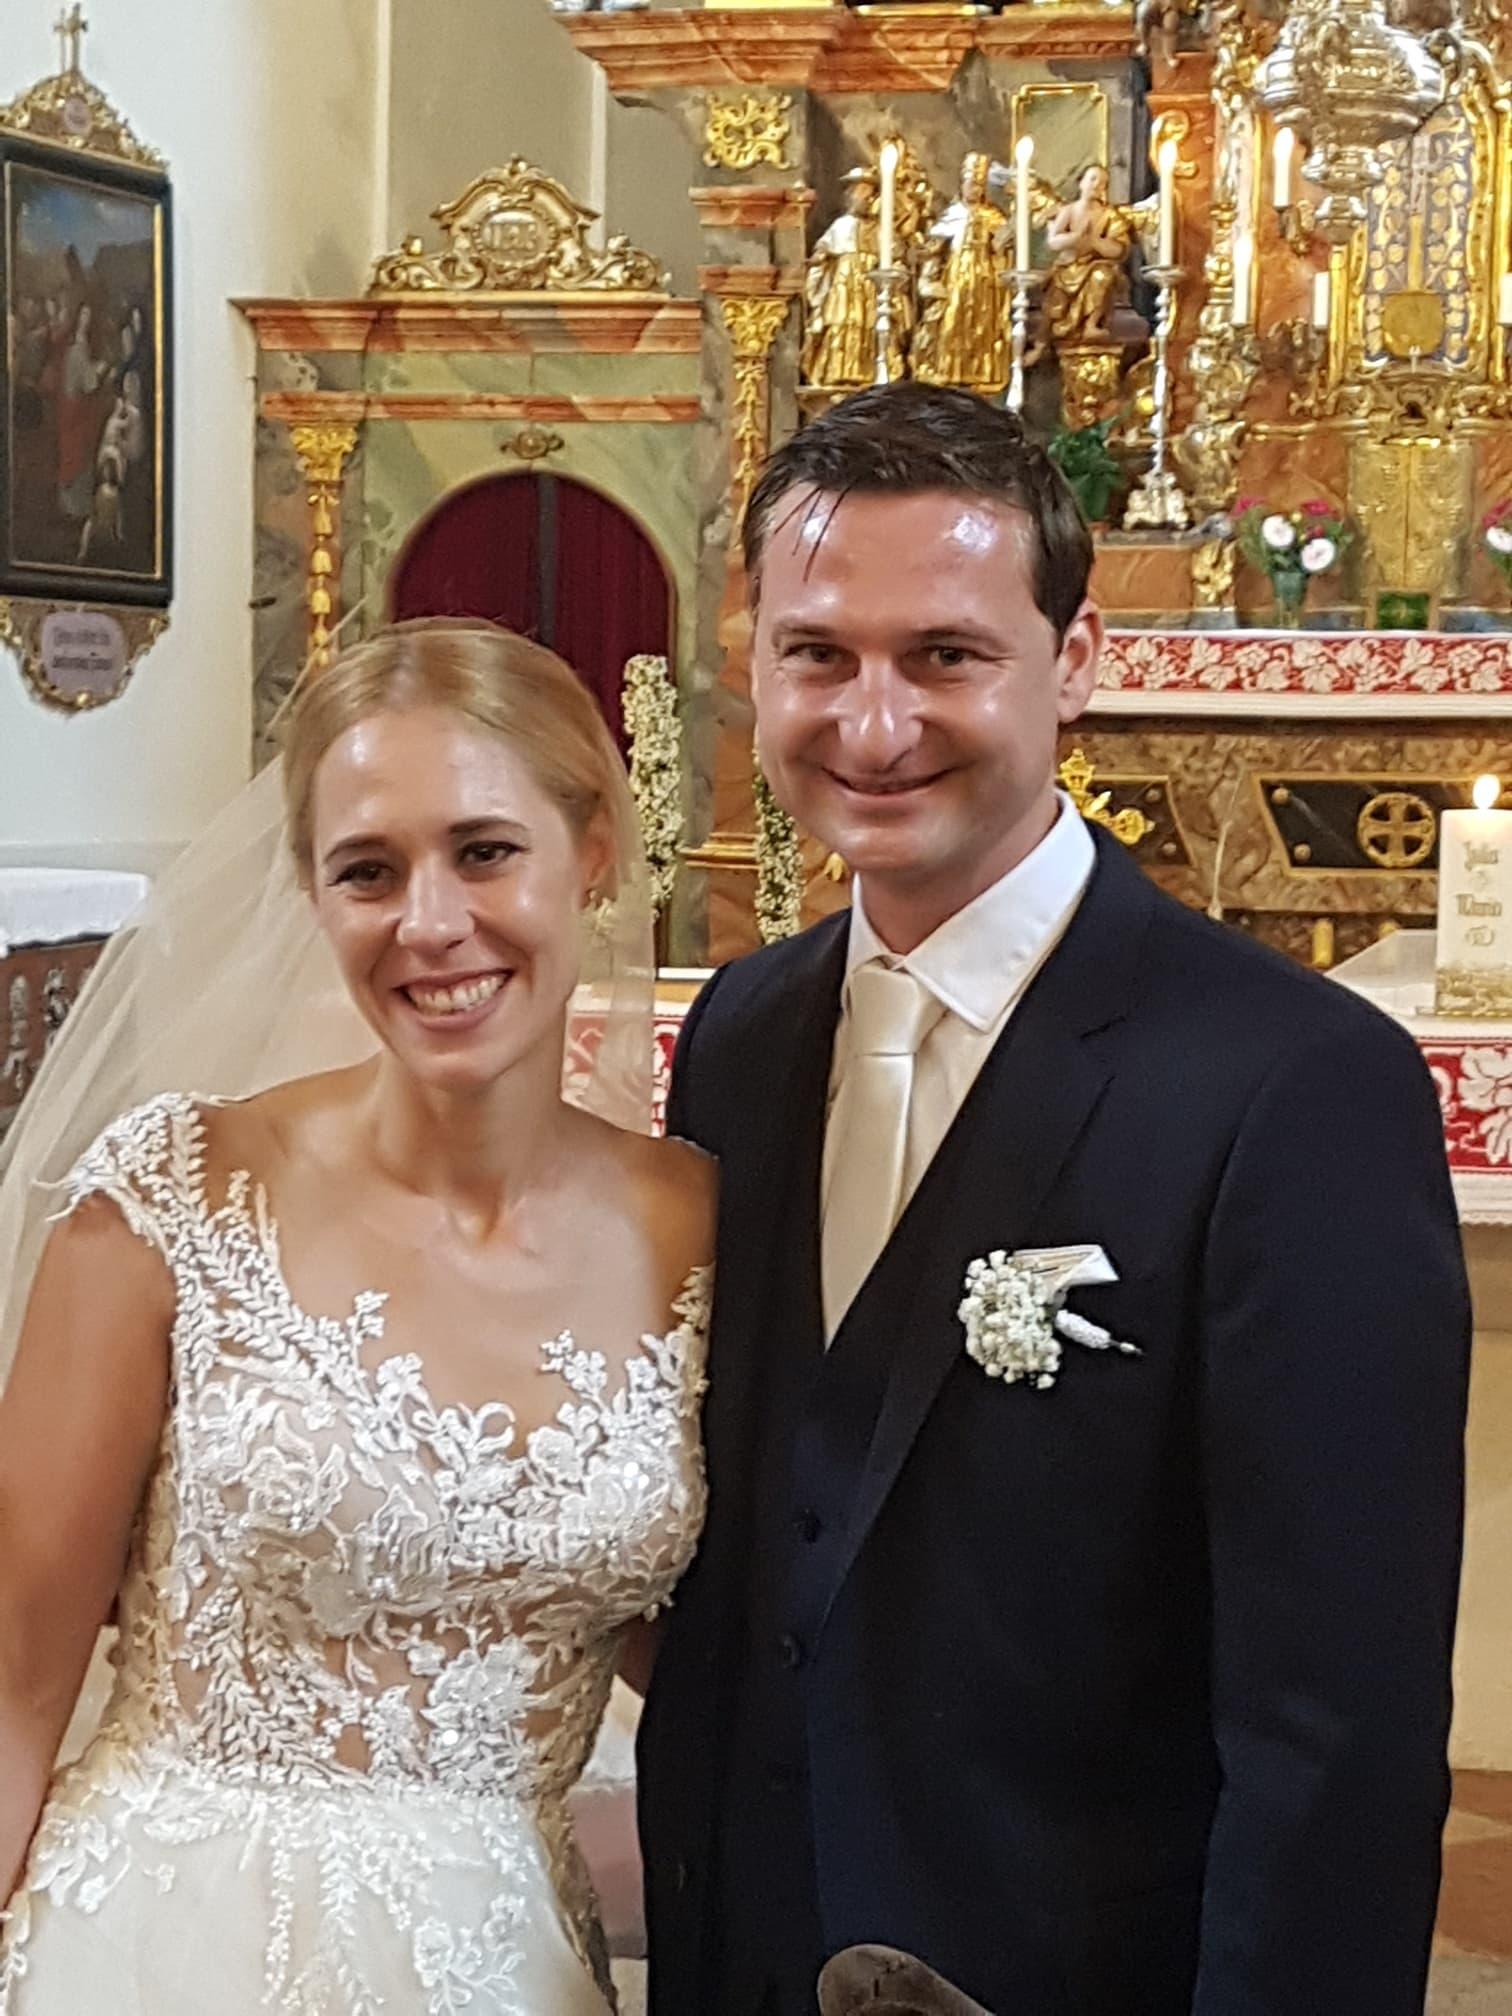 Stressfree Weddings by SandraM Wedding Planner Austria - member of the Destination Wedding Directory by Weddings Abroad Guide T1